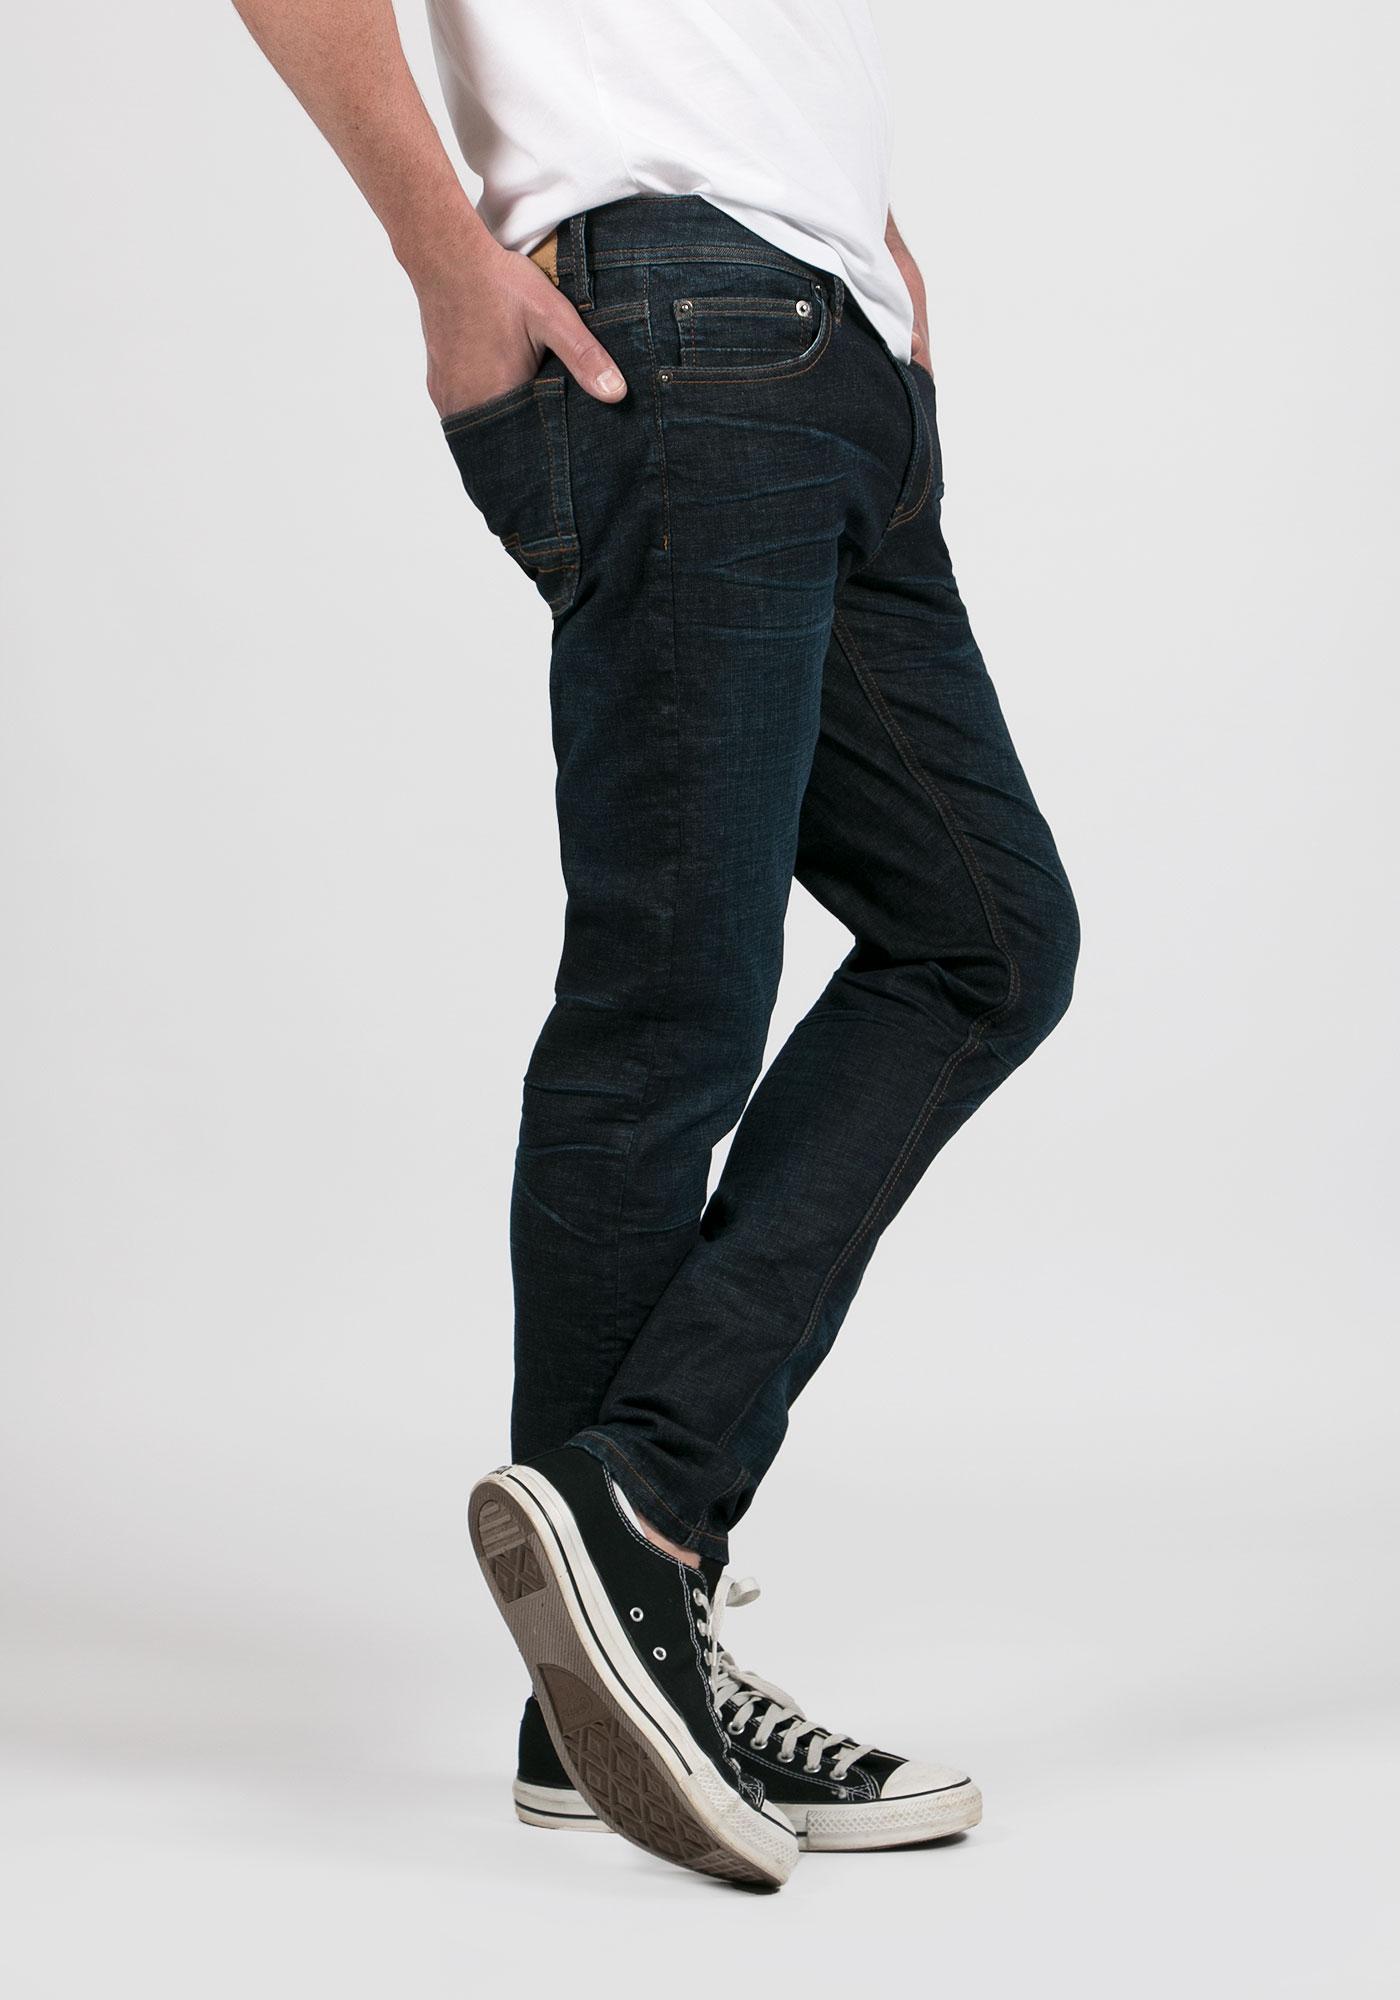 Spandex Mens Jeans